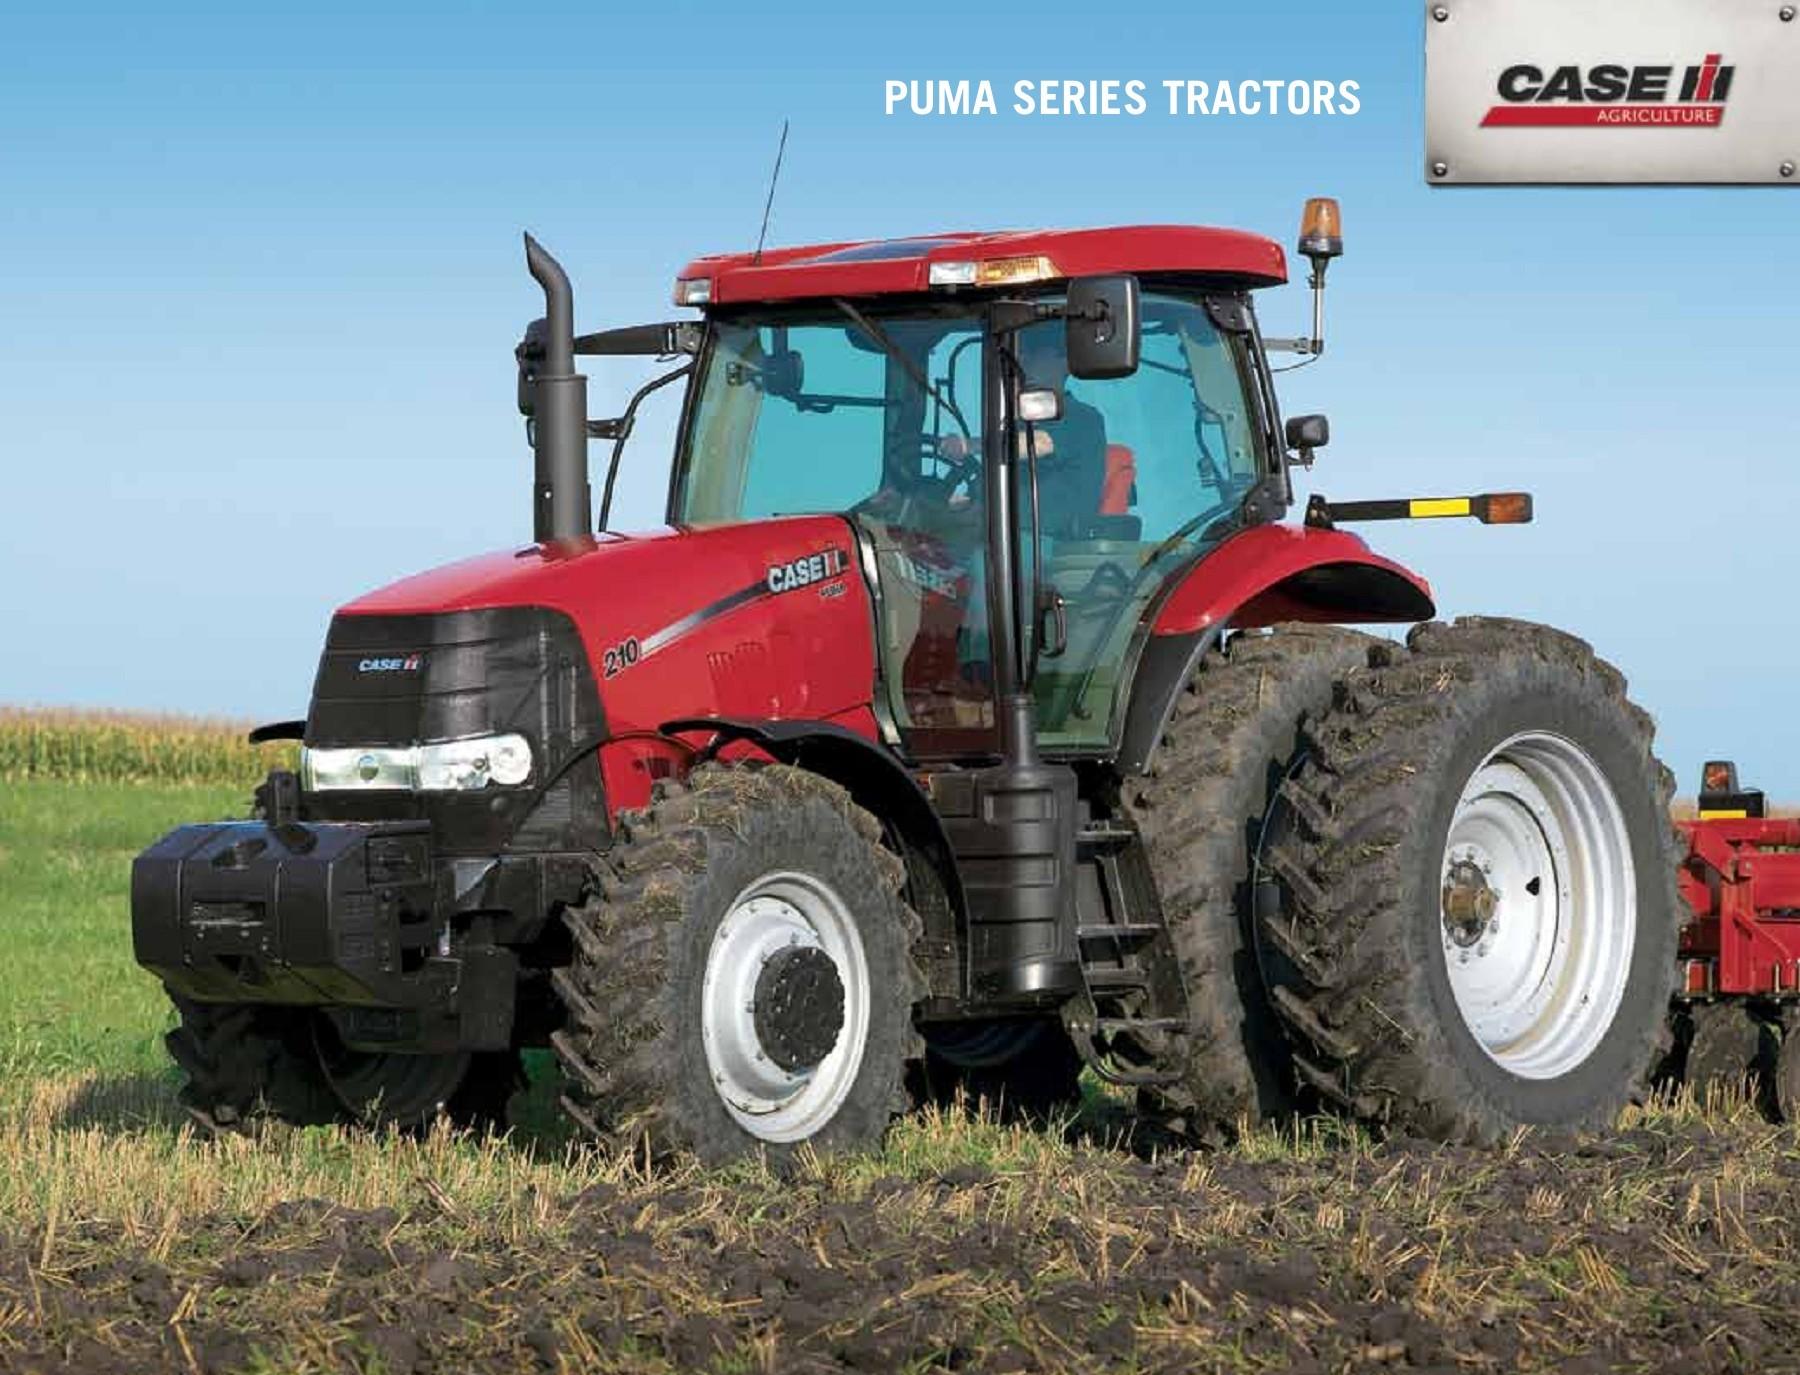 Puma Tractors Case Ih Pto Wiring Diagram Gps Trackers Thumbnails